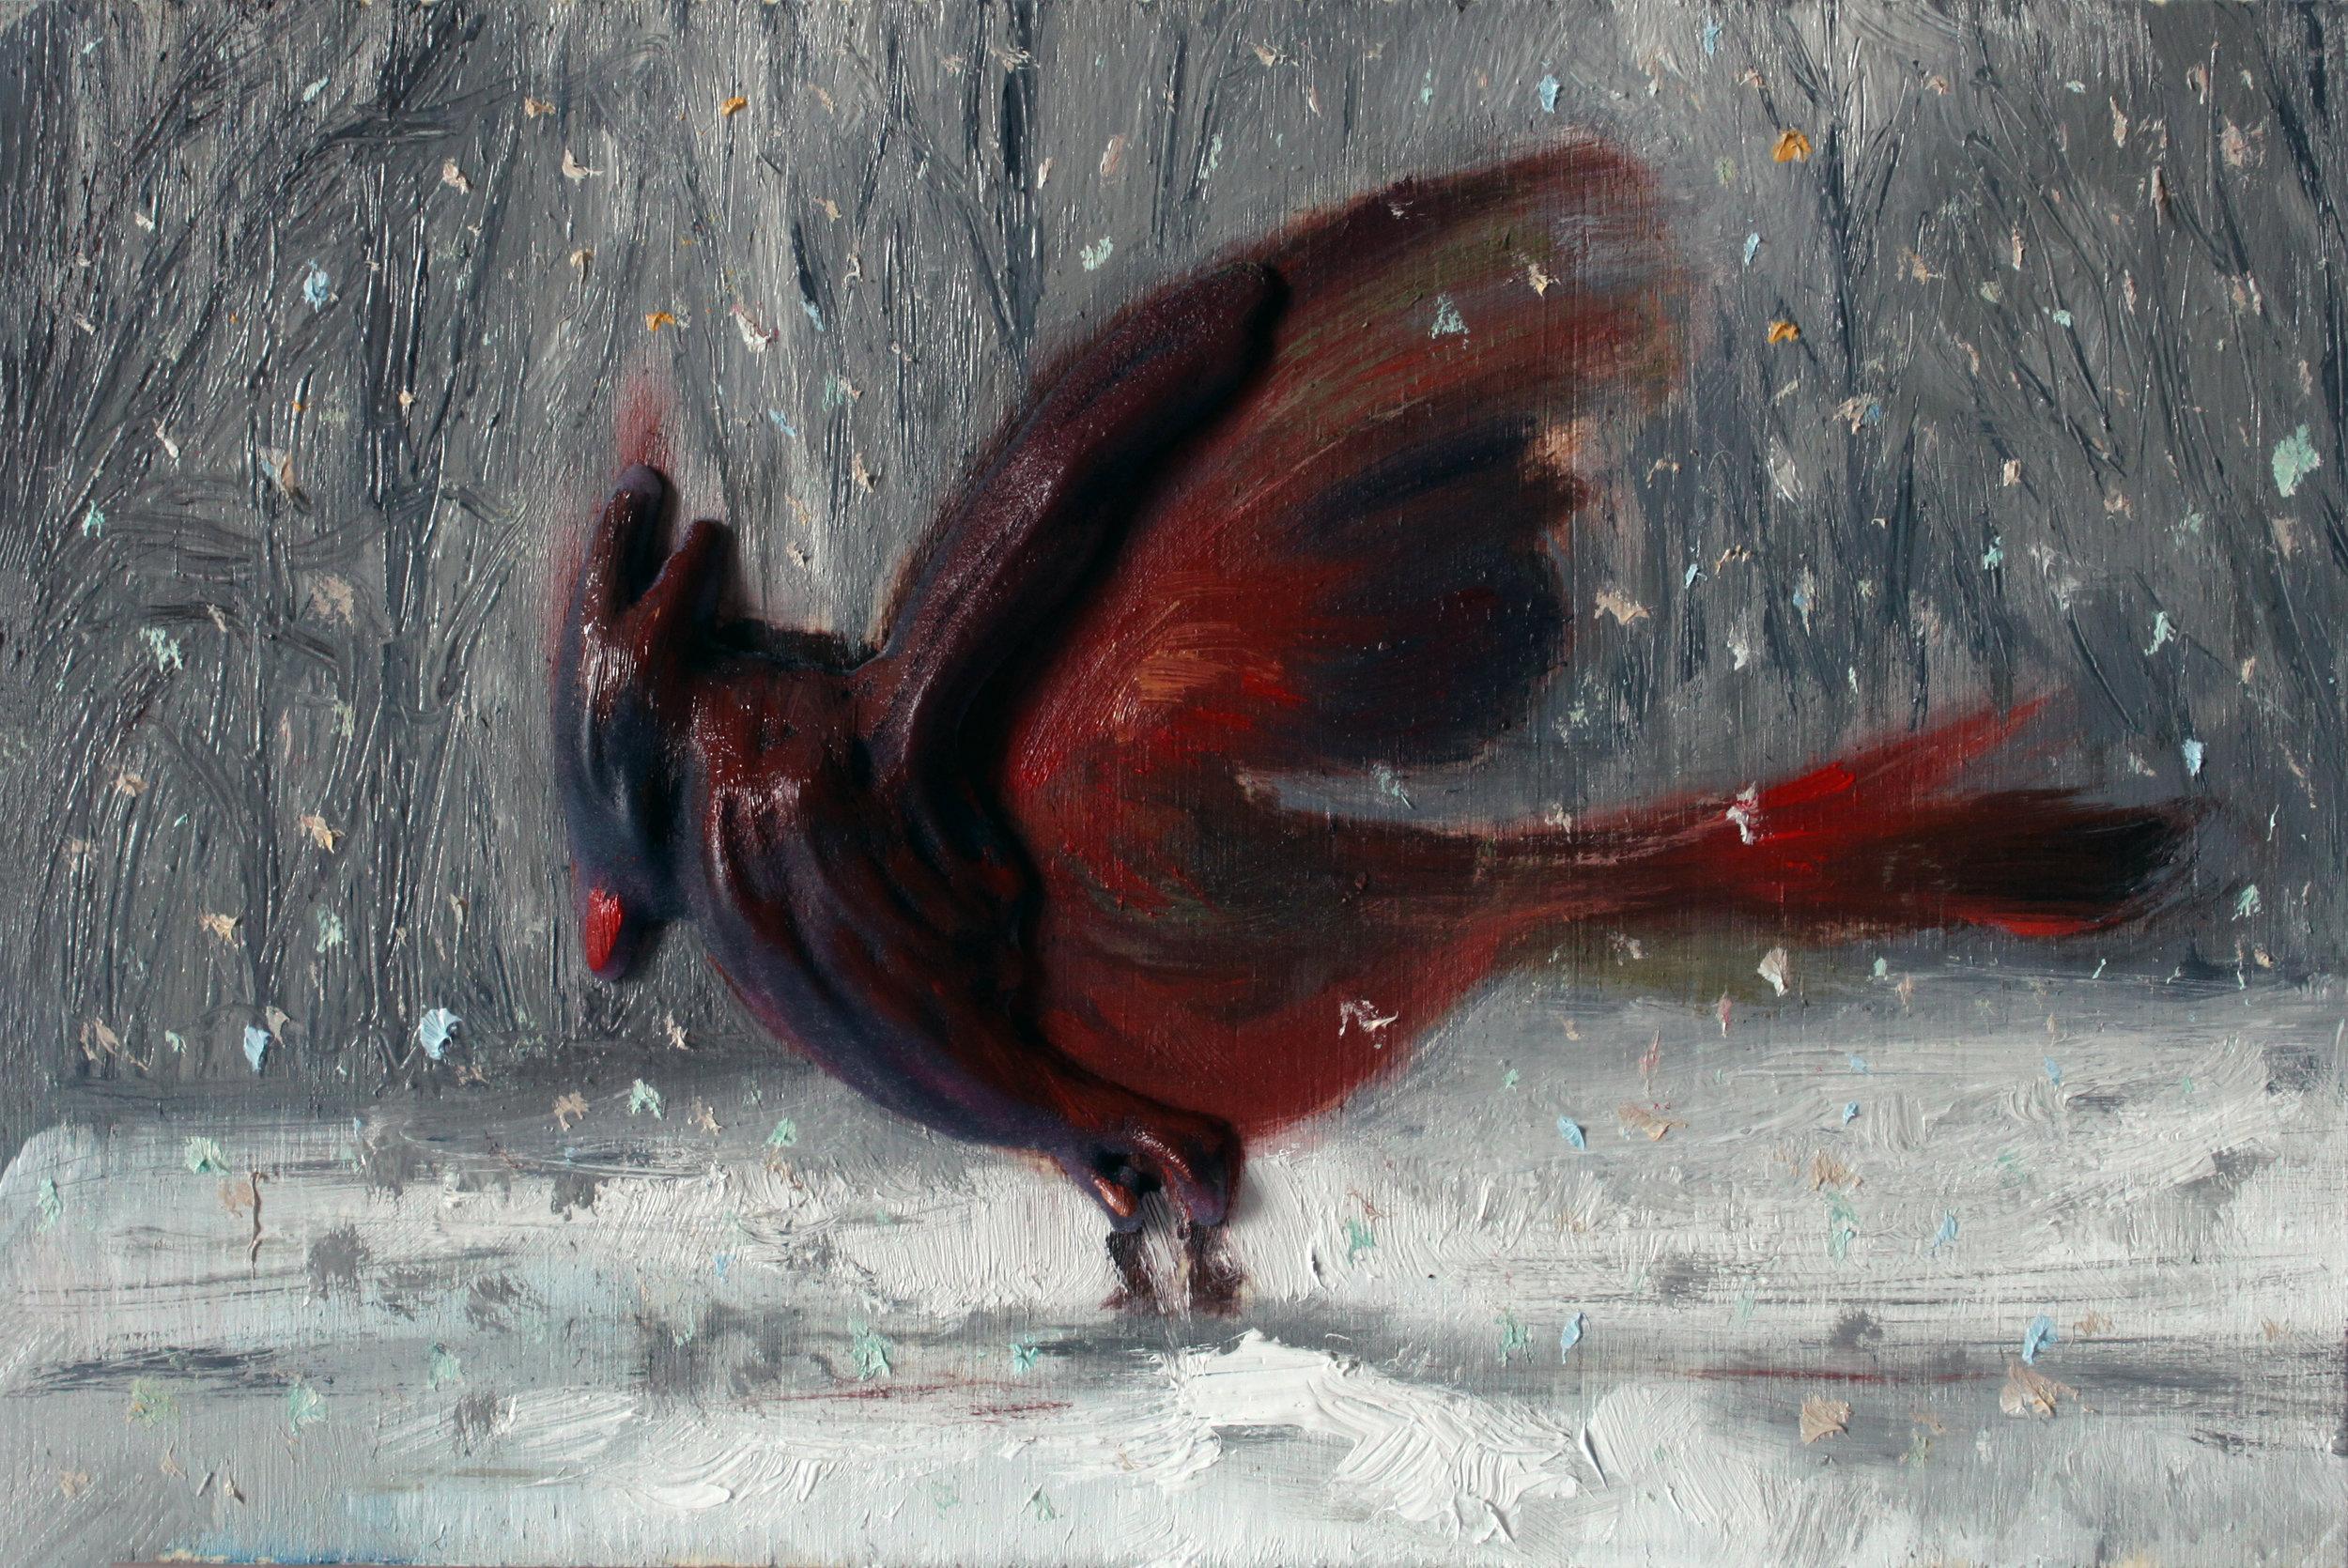 GUIDO SALIMBENI, Red Cardinal in the Snow